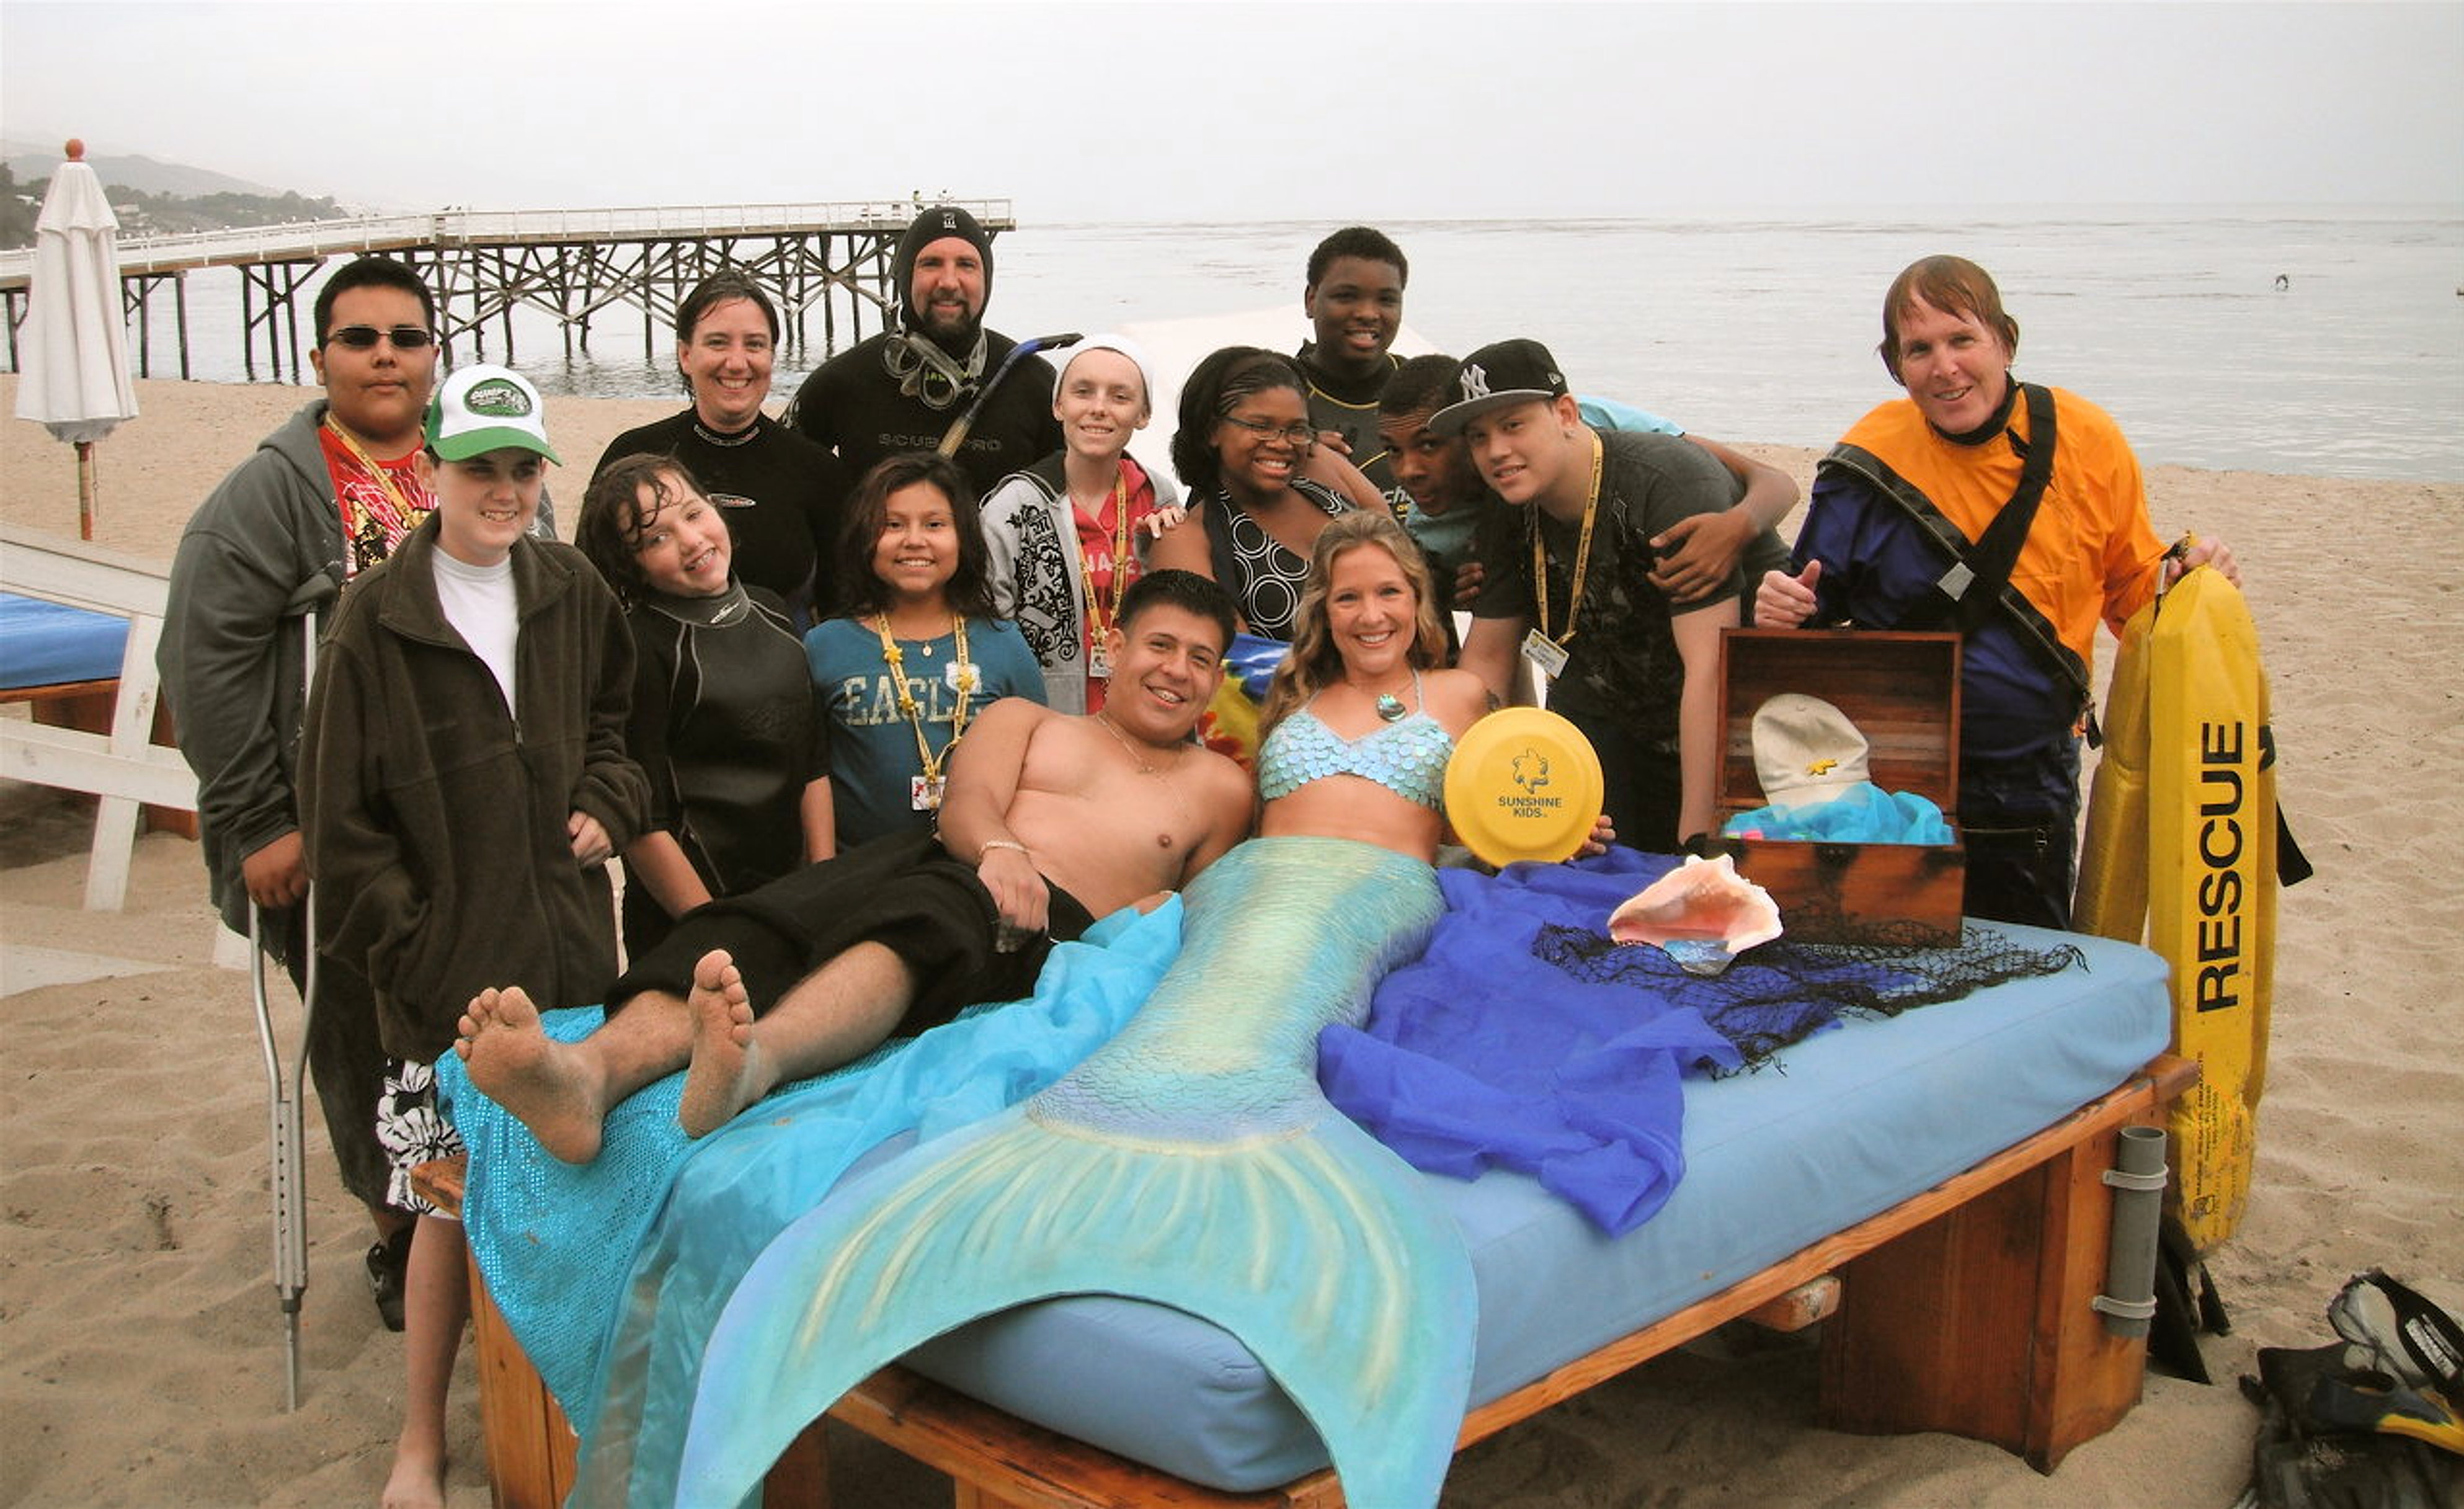 Mermaid Linden - Professional Mermaid - Birthday Party Idea & Theme ...